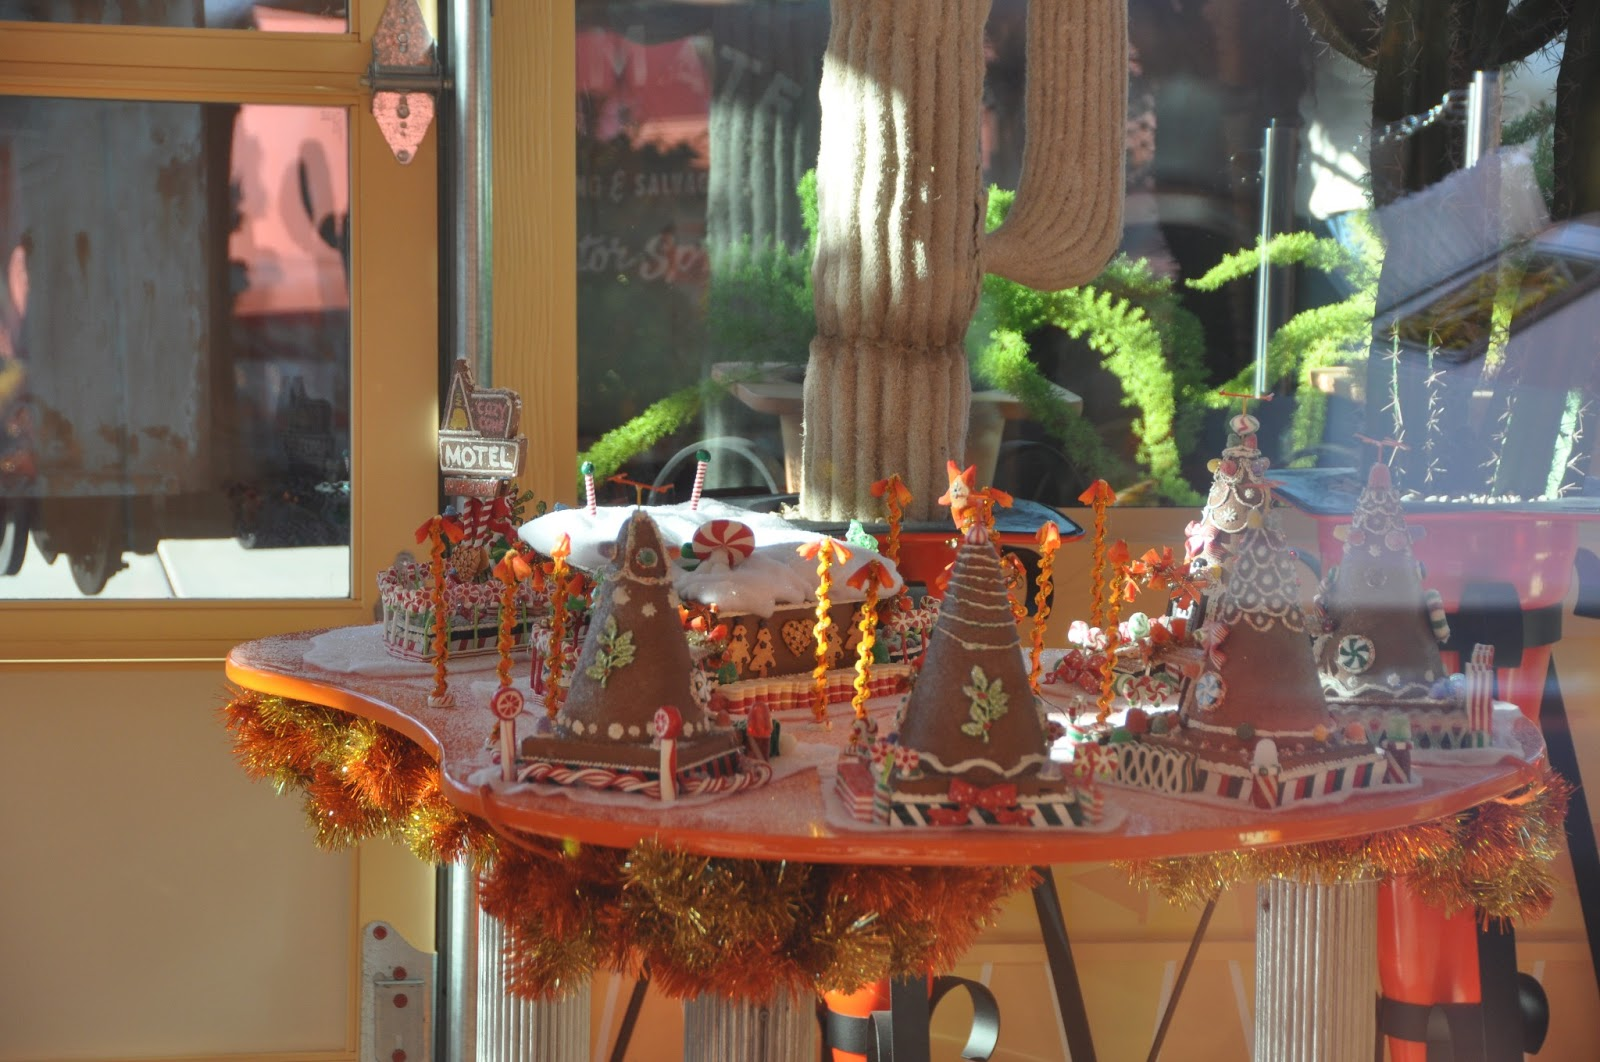 Disney, Disneyland Christmas, Disney Christmas, Disney blog, Disneyland, Disney fan, Disney lover, magical kingdom, what to do at Disneyland, Disney fashion, California adventure, California advenure food, whre to eat at California adventure, Disney apparel, Disney food, Disney food review, mickey mouse ears, where to eat at Disneyland, fashion blog, fashion blogger, style blog, style blogger, mens fashion, mens fashion blog, mens style, mens style blog, womens style blog, anthropologie ootd blog, anthropologie ootd, anthropologie, ootd, mens ootd, womens ootd